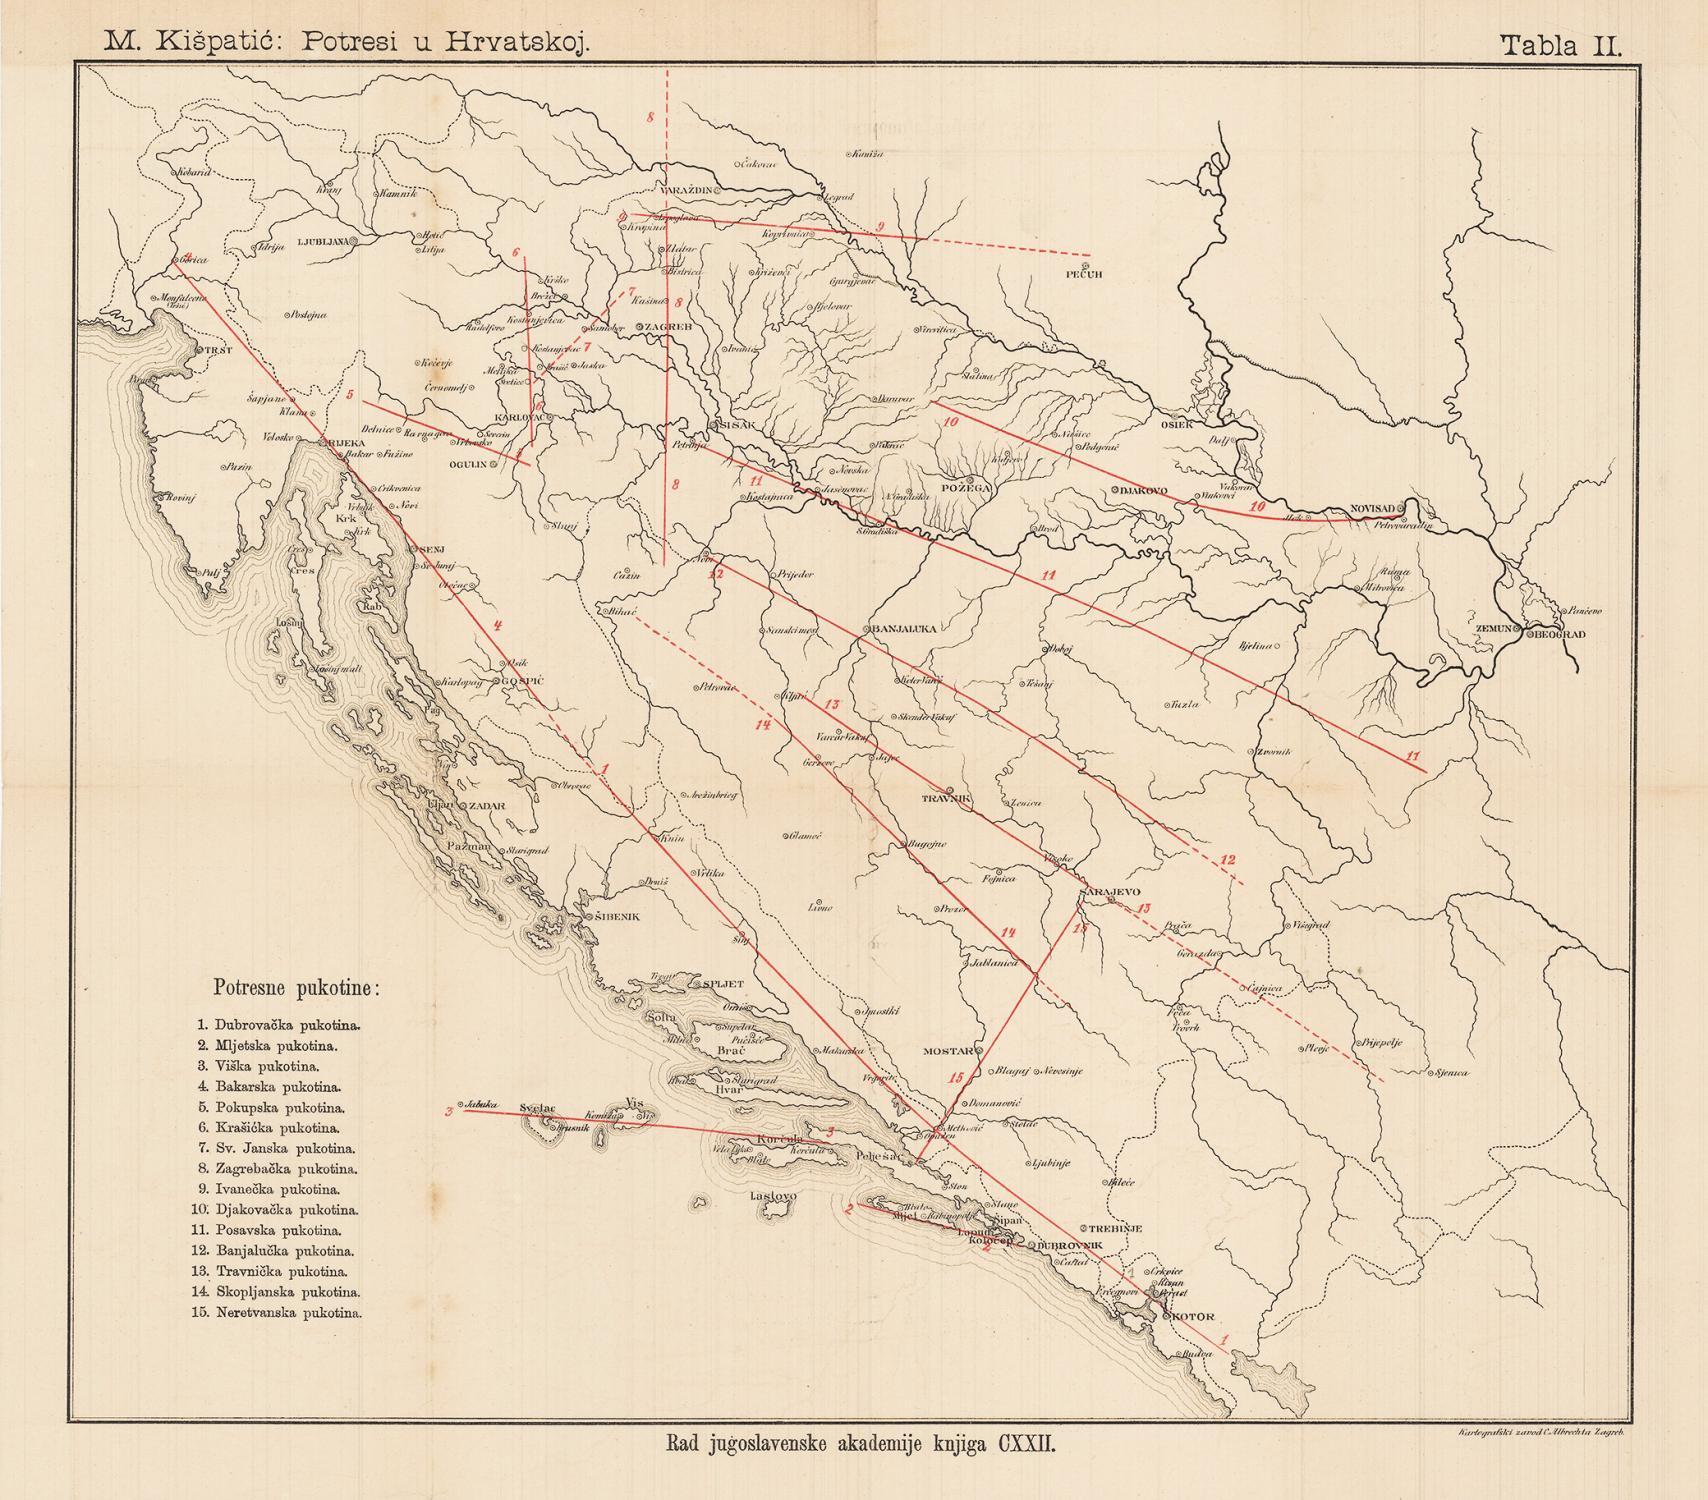 CROATIA / BOSNIA EARTHQUAKE MAP: M. Kispatic...